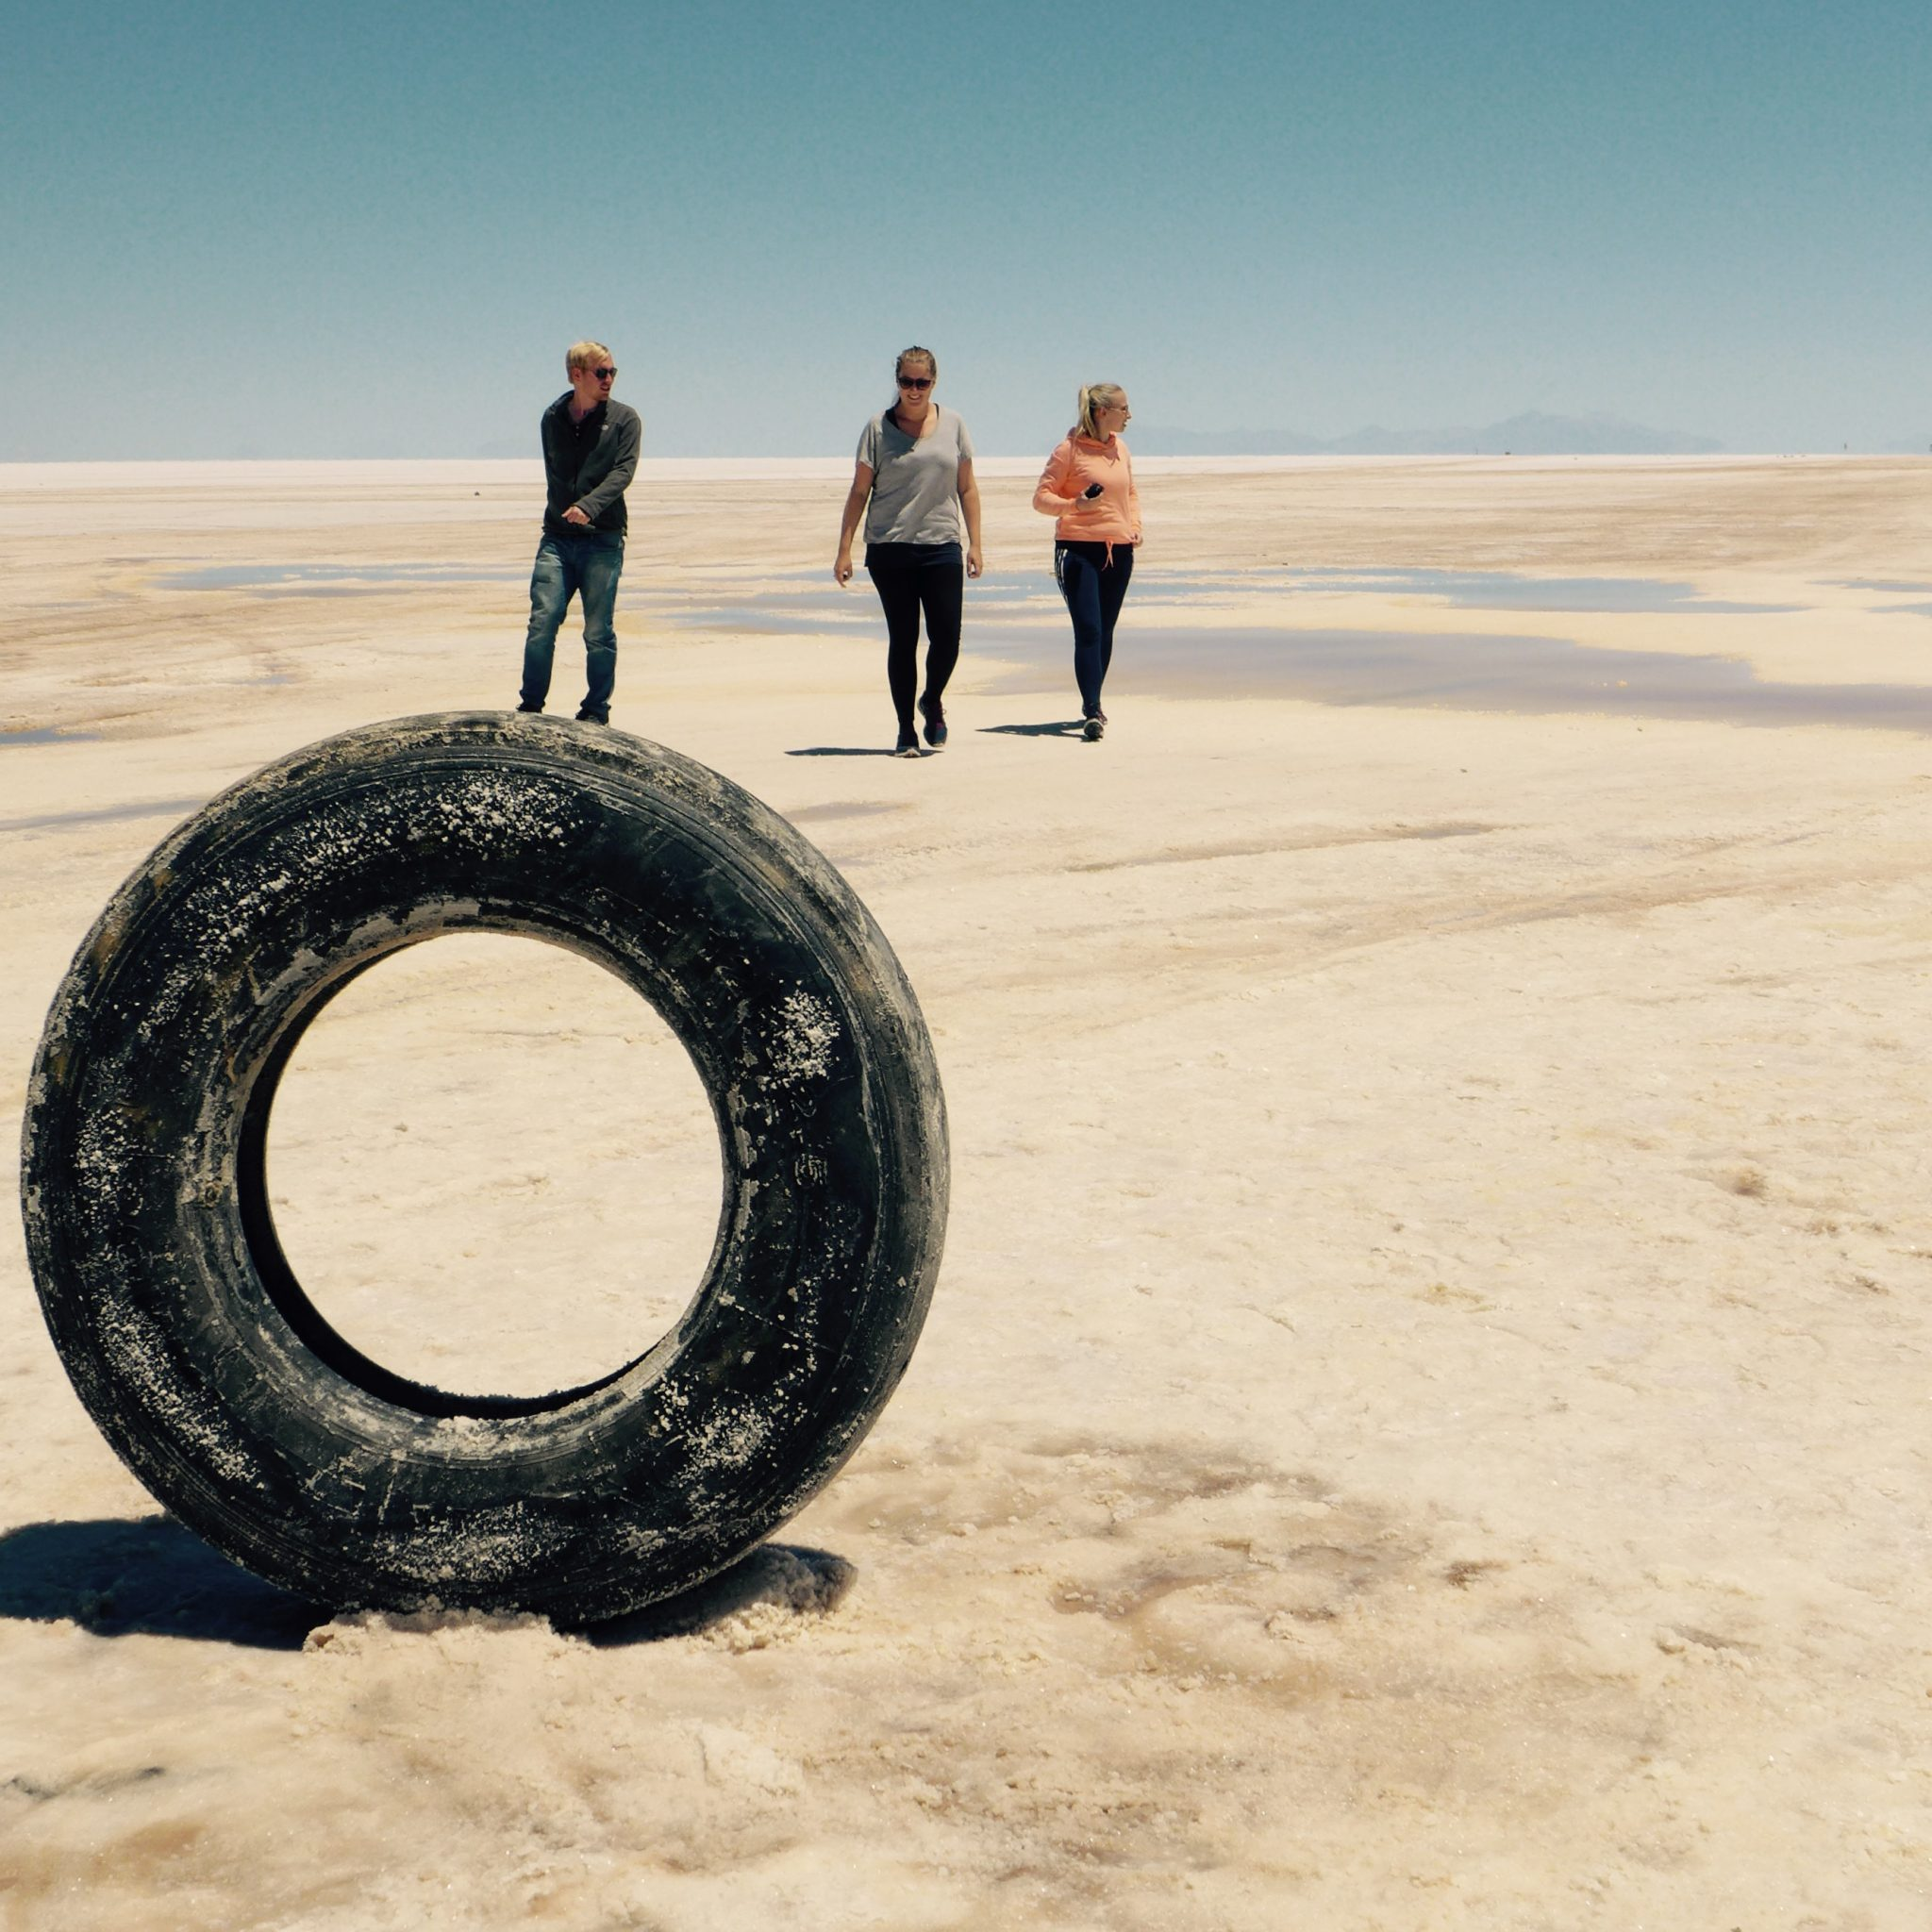 back online! The three authors in the Uyuni desert